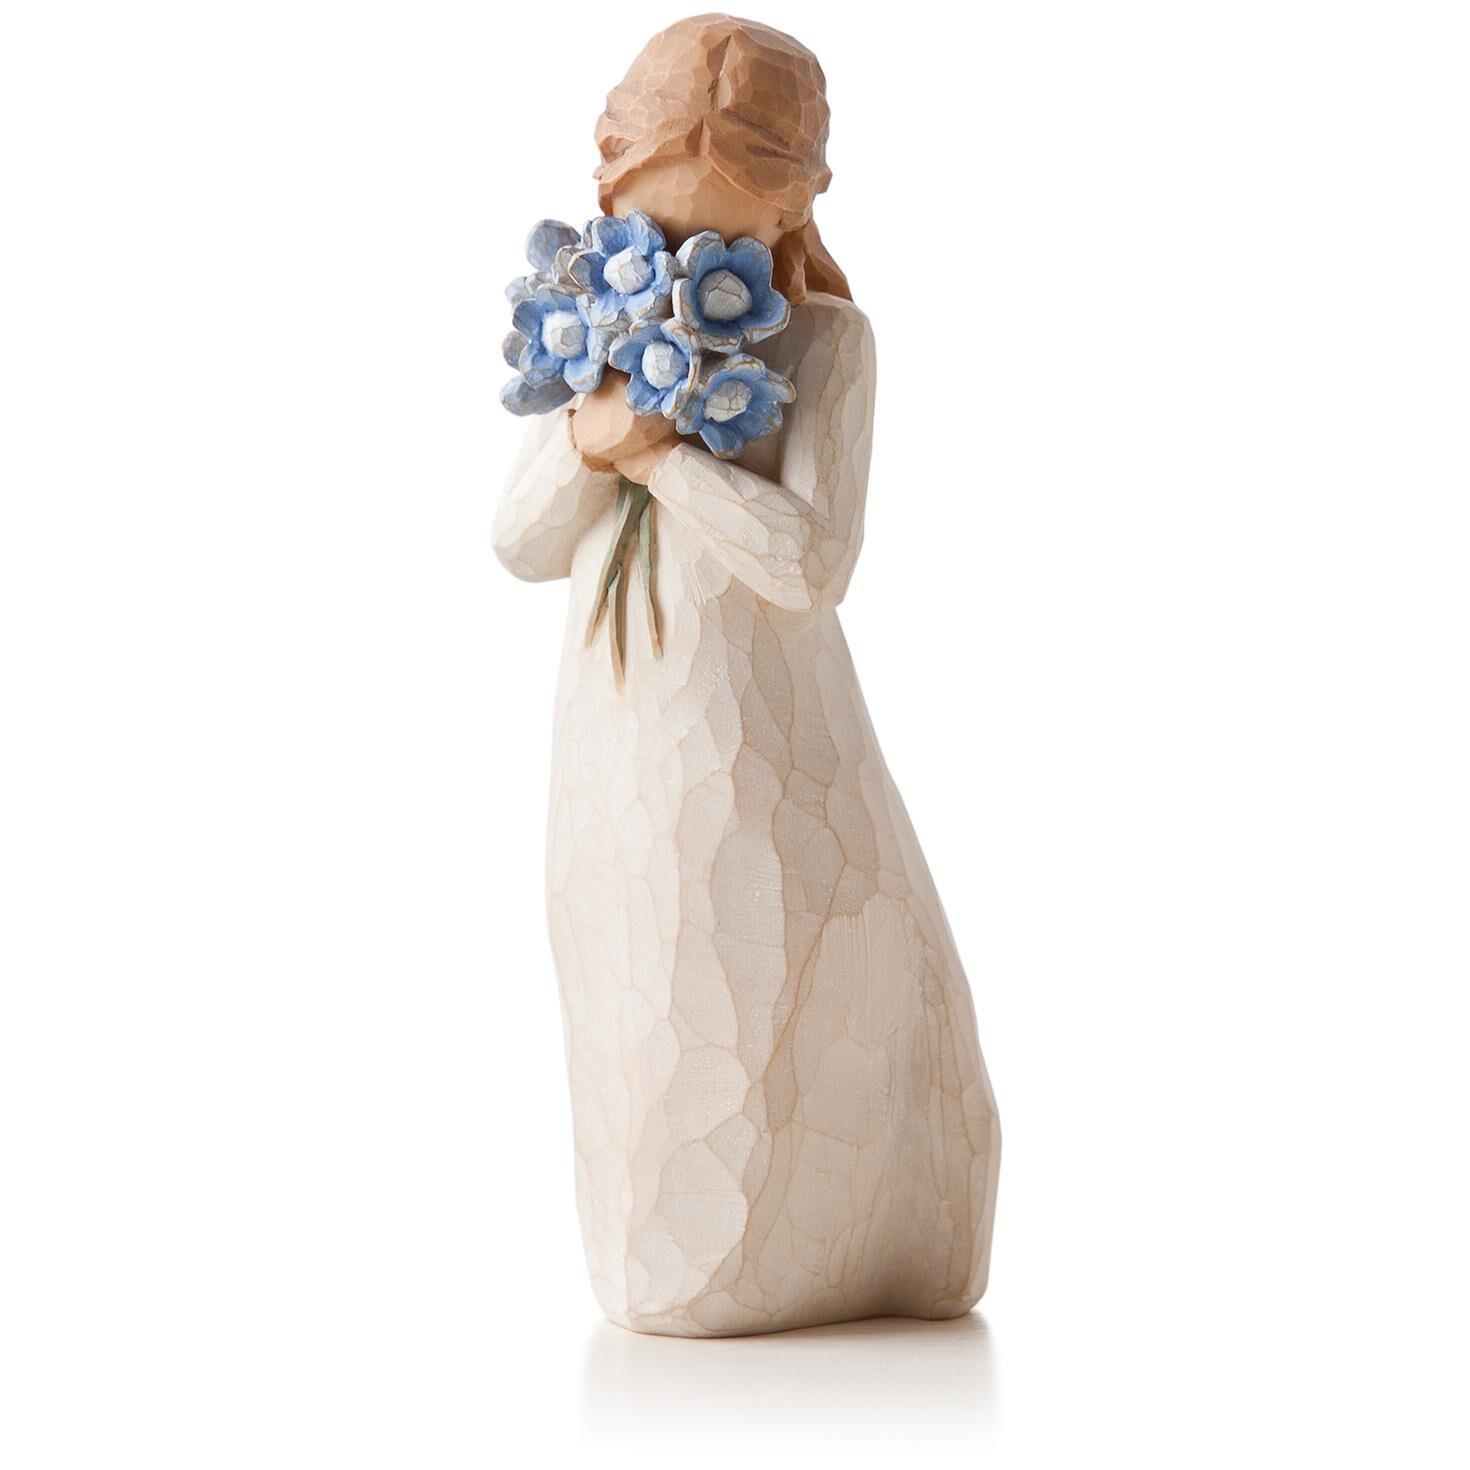 Willow tree forget me not friendship figurine figurines hallmark dhlflorist Gallery